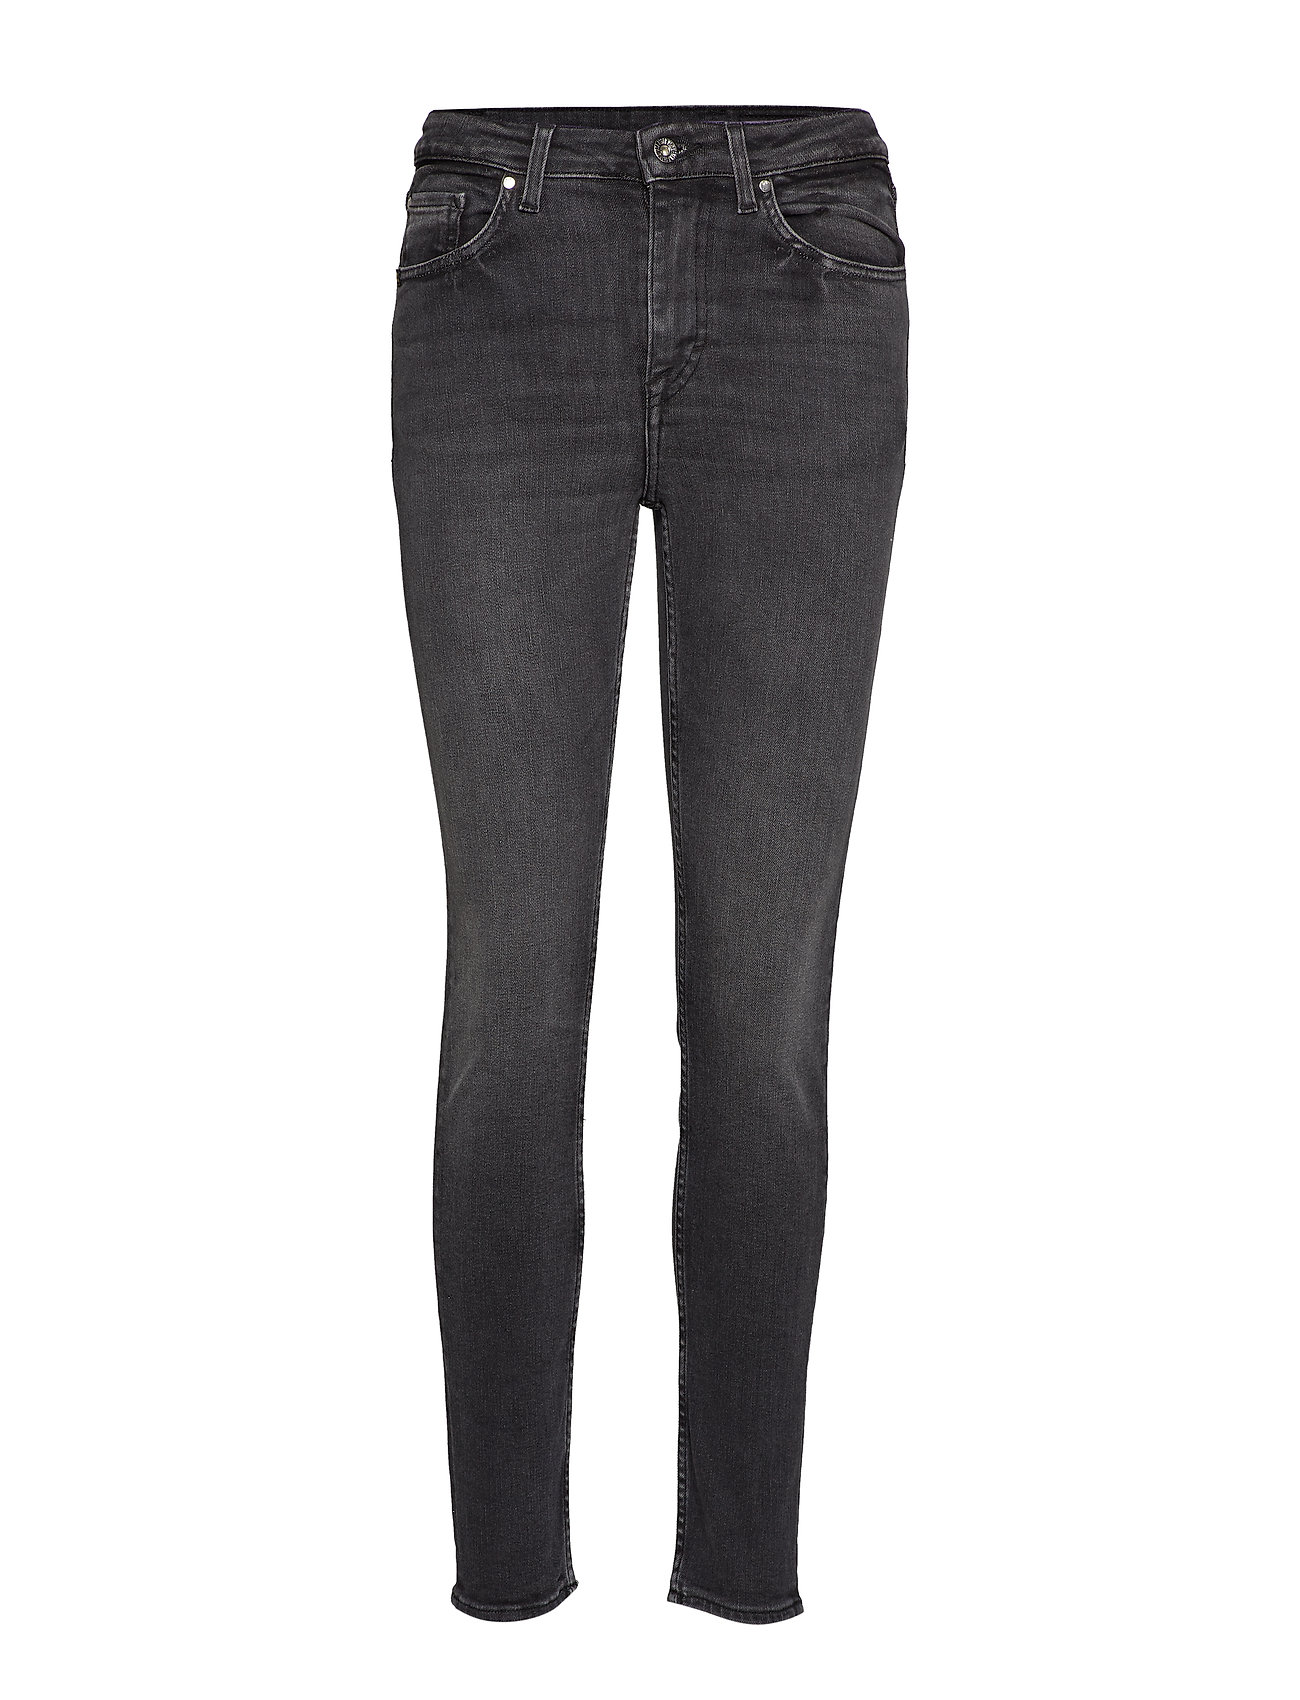 921aec41 Shelly (Black) (90.35 €) - Tiger of Sweden Jeans - | Boozt.com